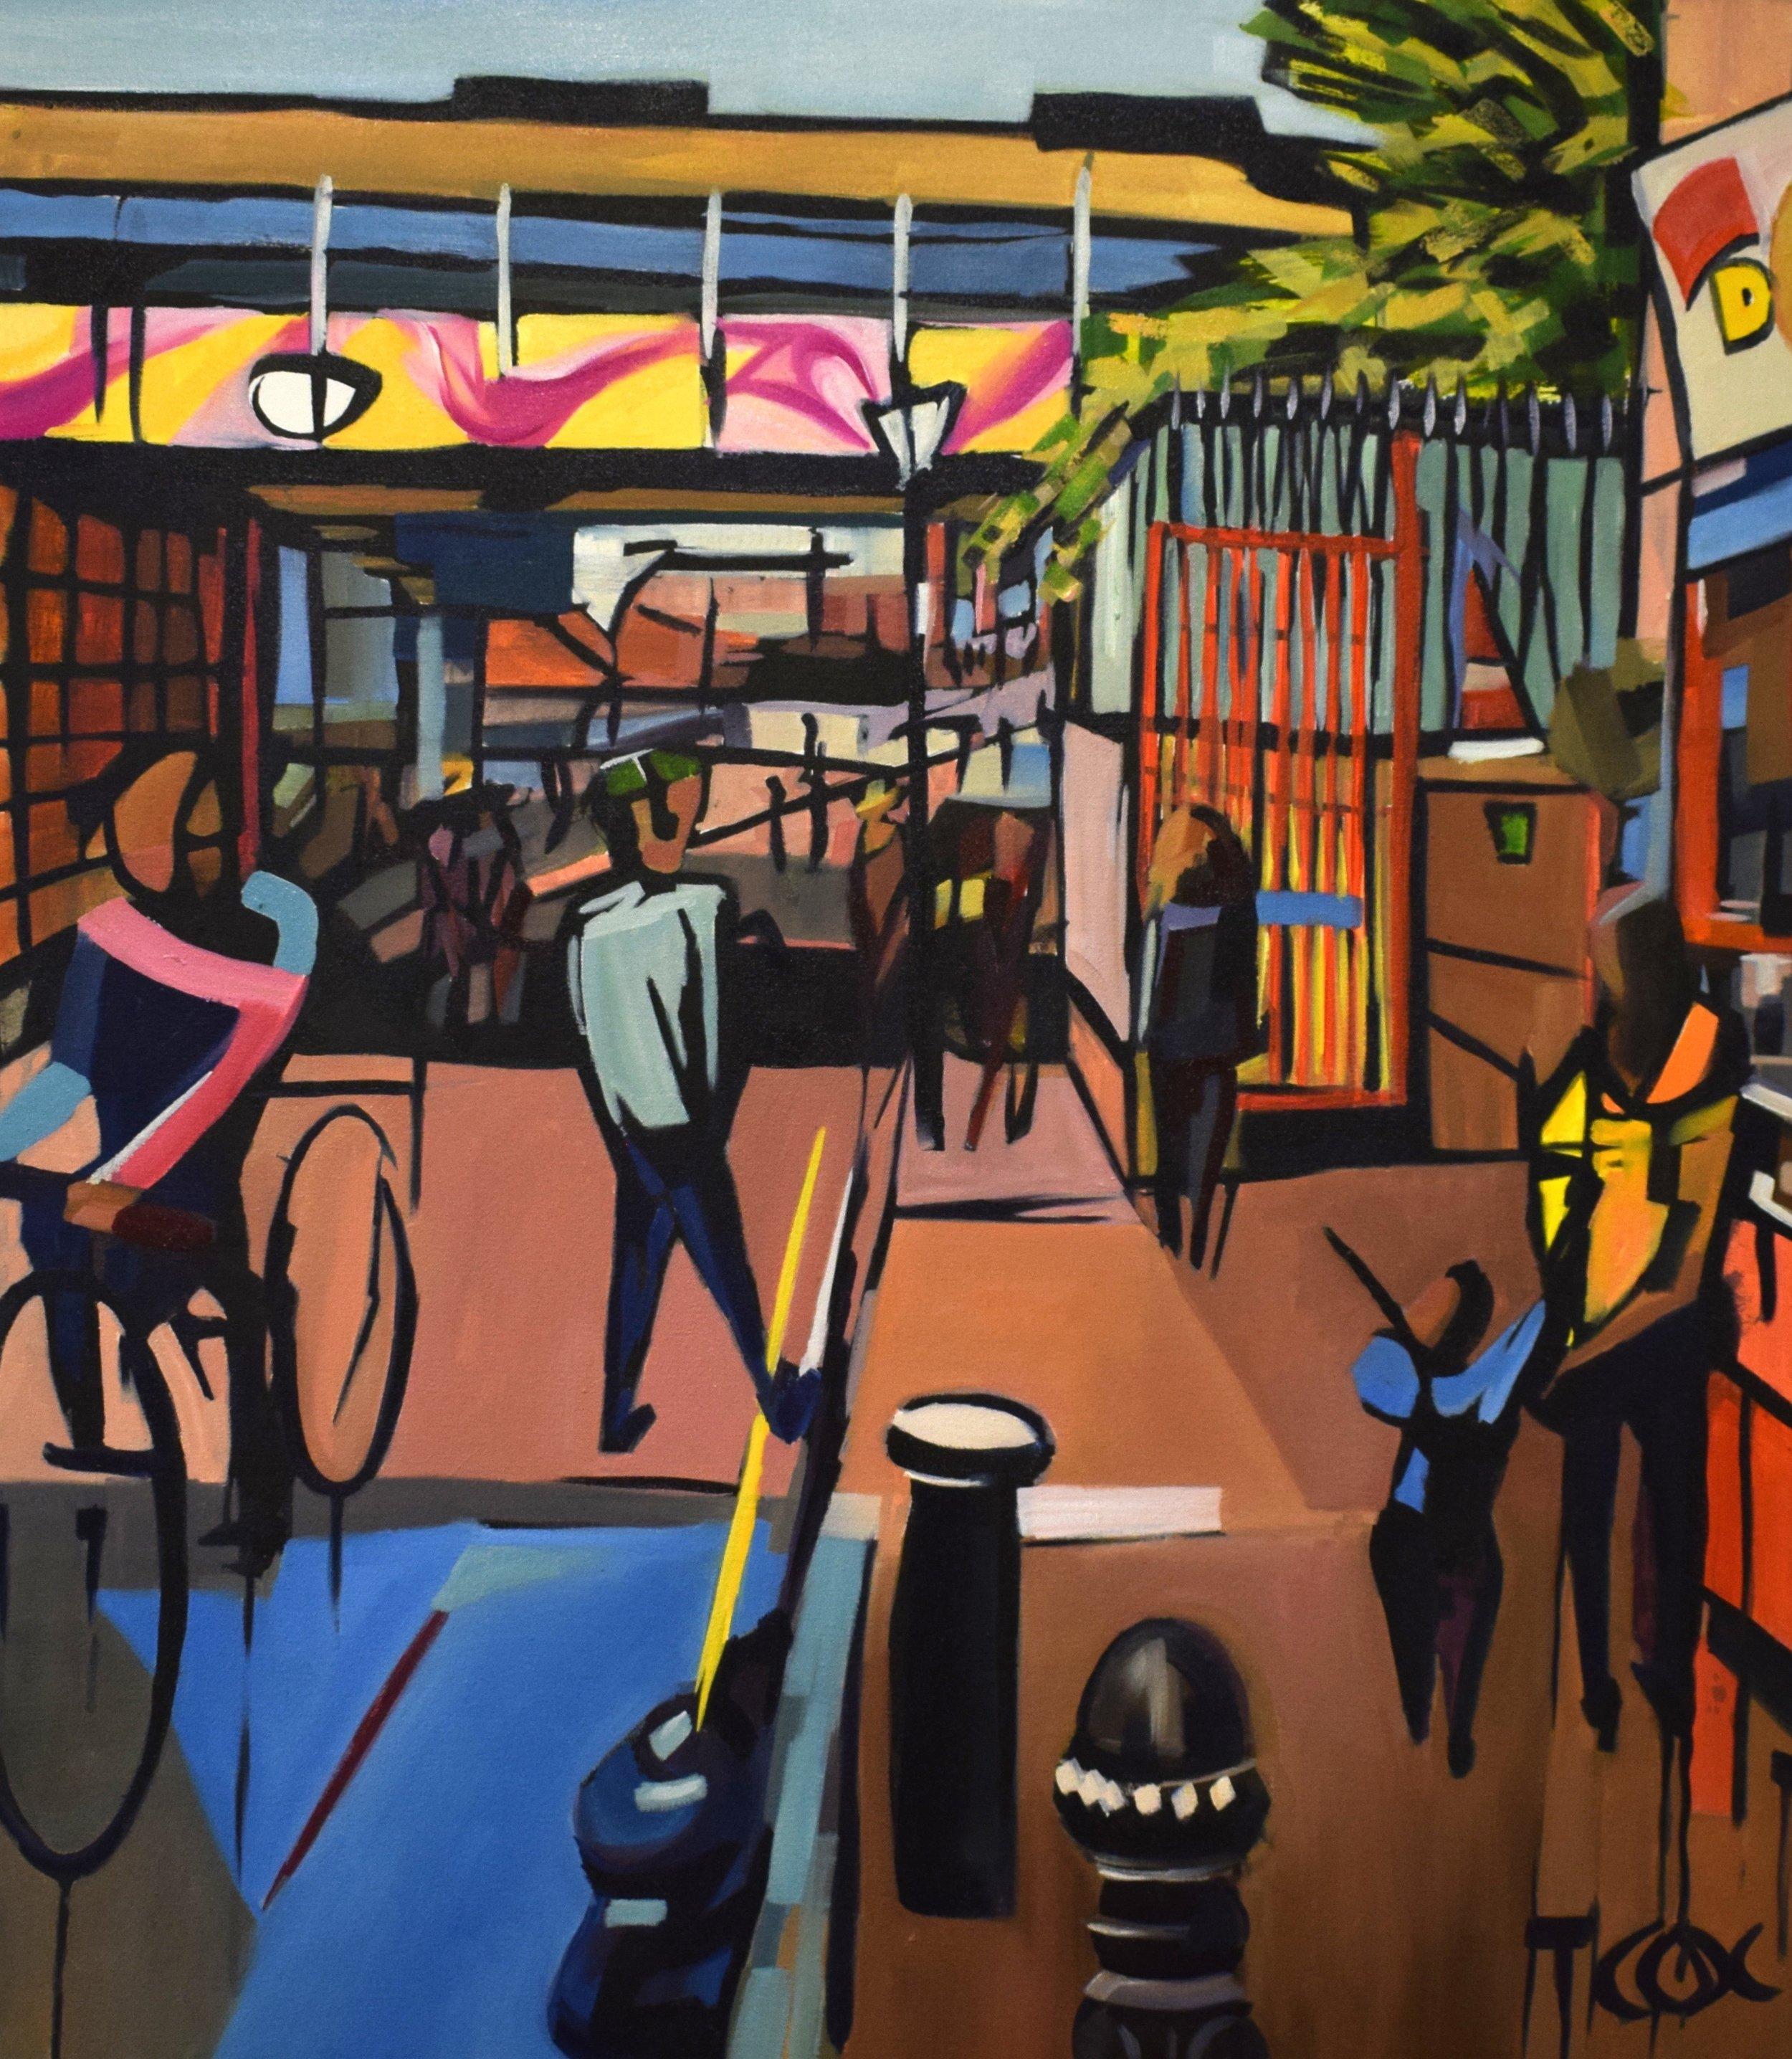 Portobello Paradise, 2018 | Ink & oil on canvas | 70 x 80 cm | £1,250